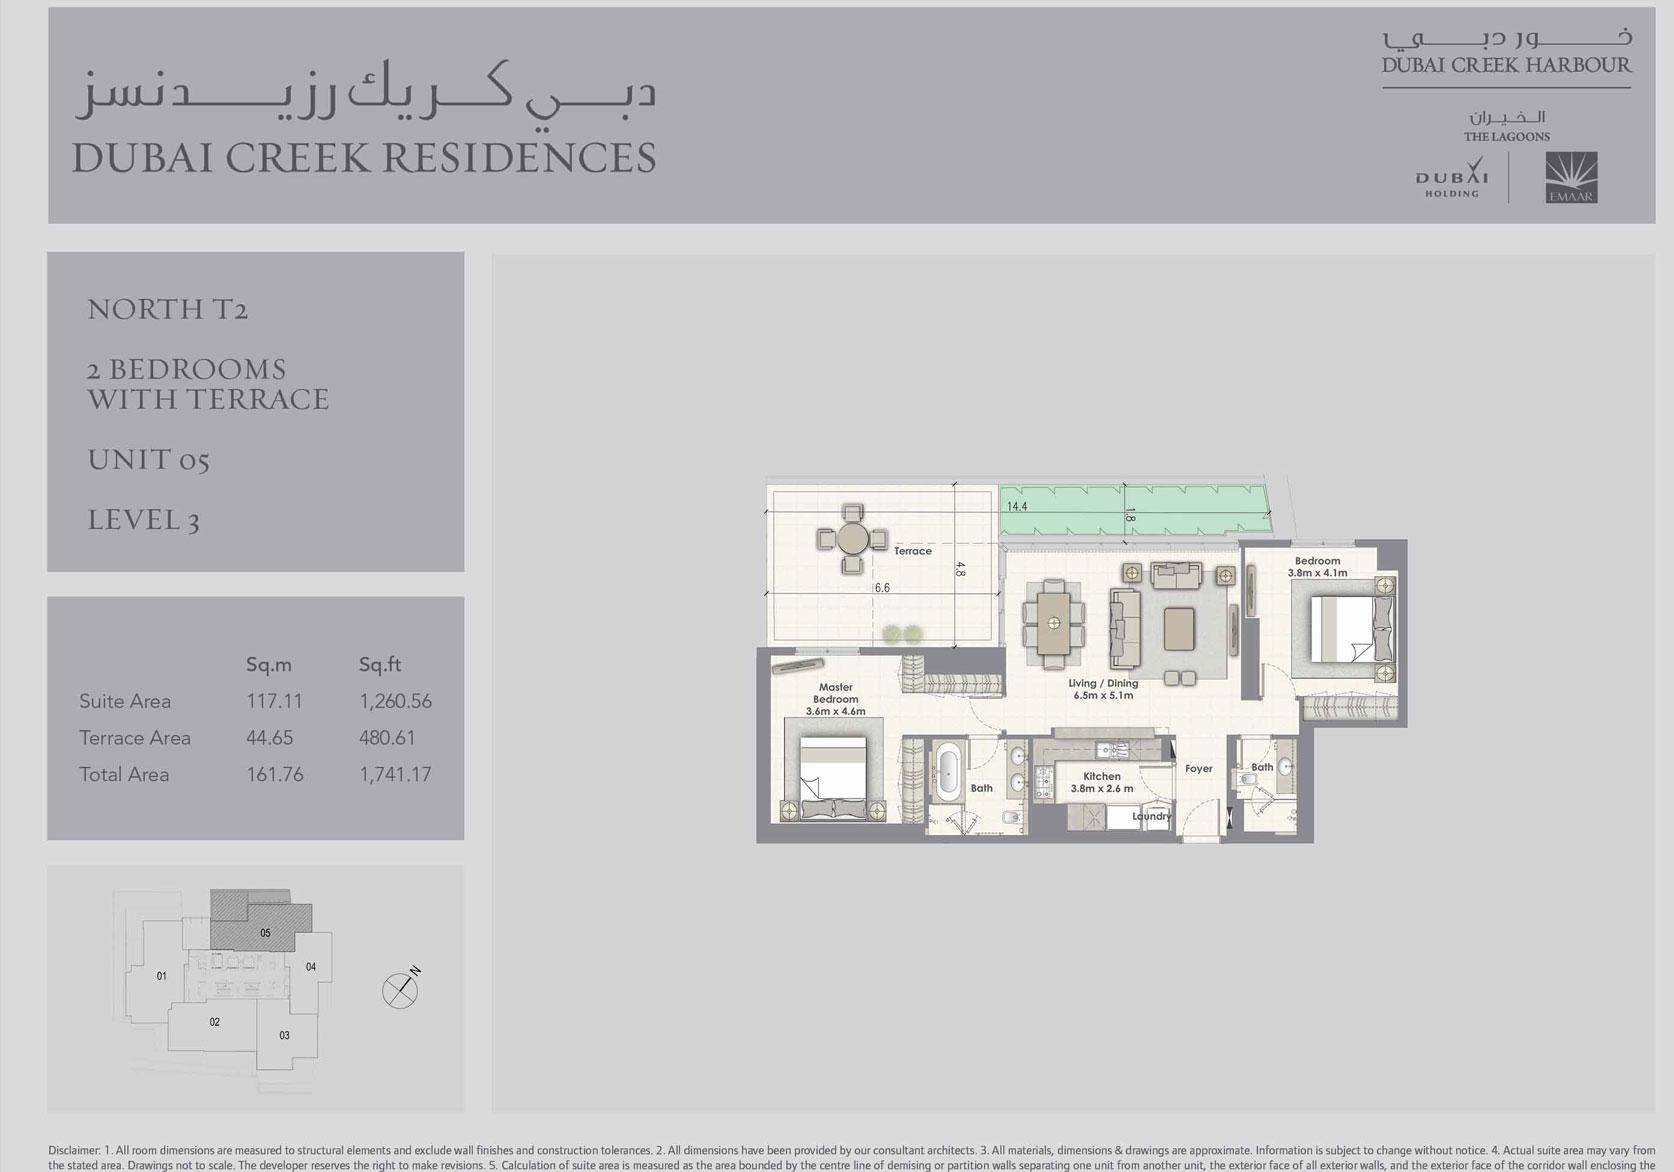 2 Bedroom with Terrace